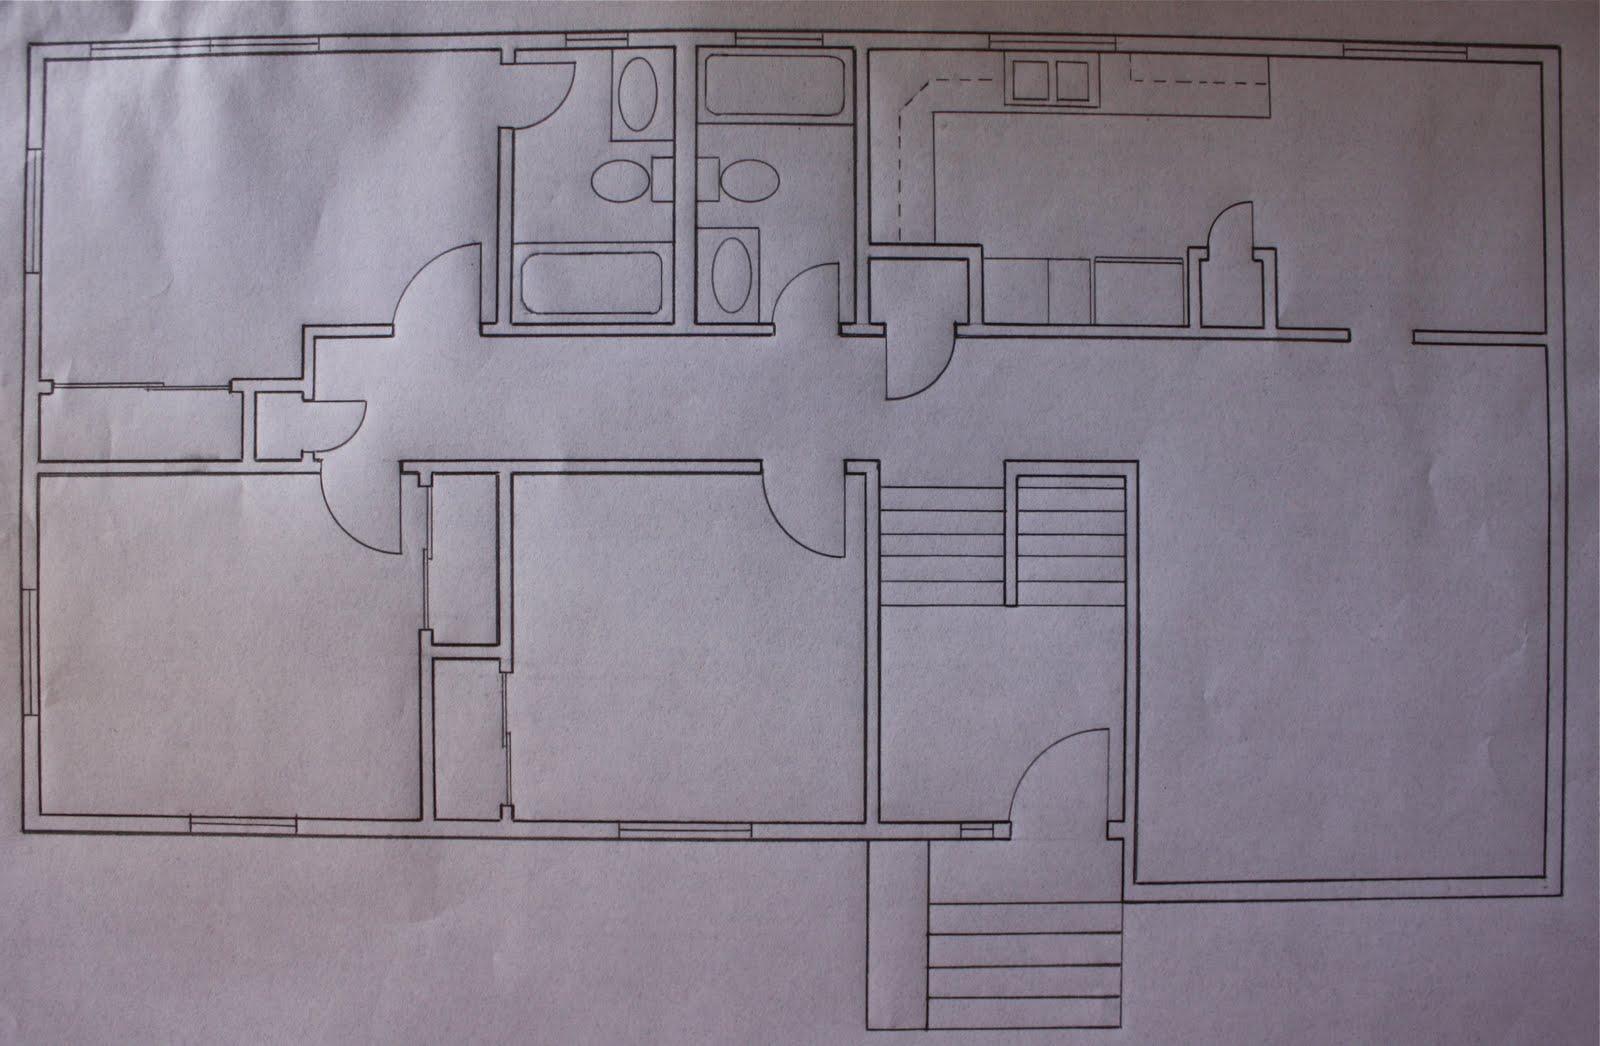 Perspective floor plan house House decor